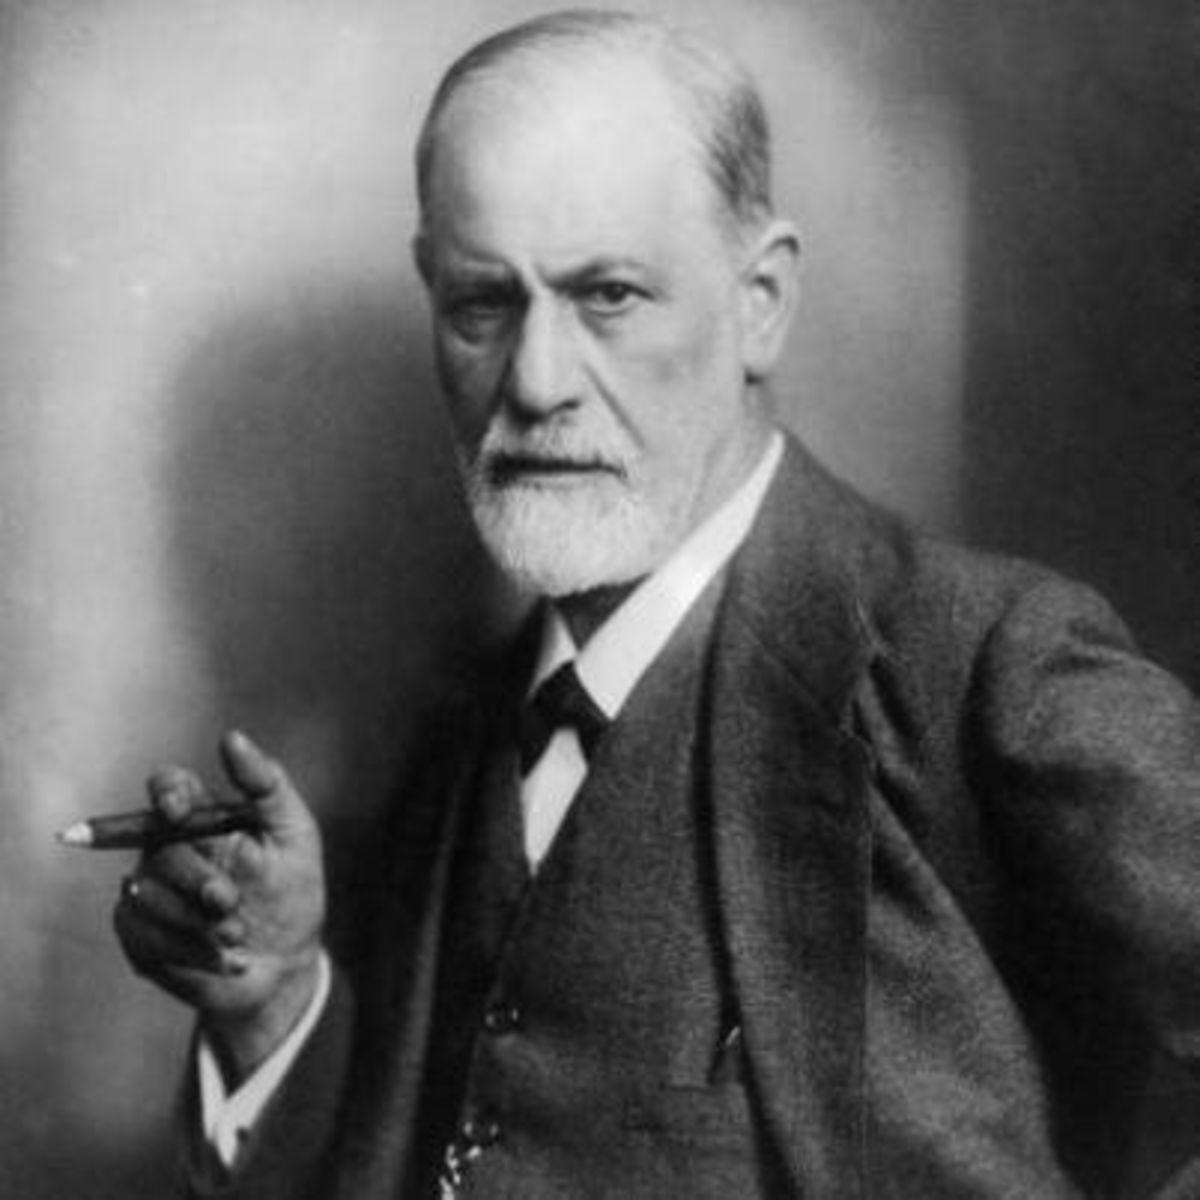 Sigmund Freud Omul Care A Schimbat Viziunea Asupra Psihicului Uman Mix De Cultura Sigmund Freud Psychoanalysis Freud